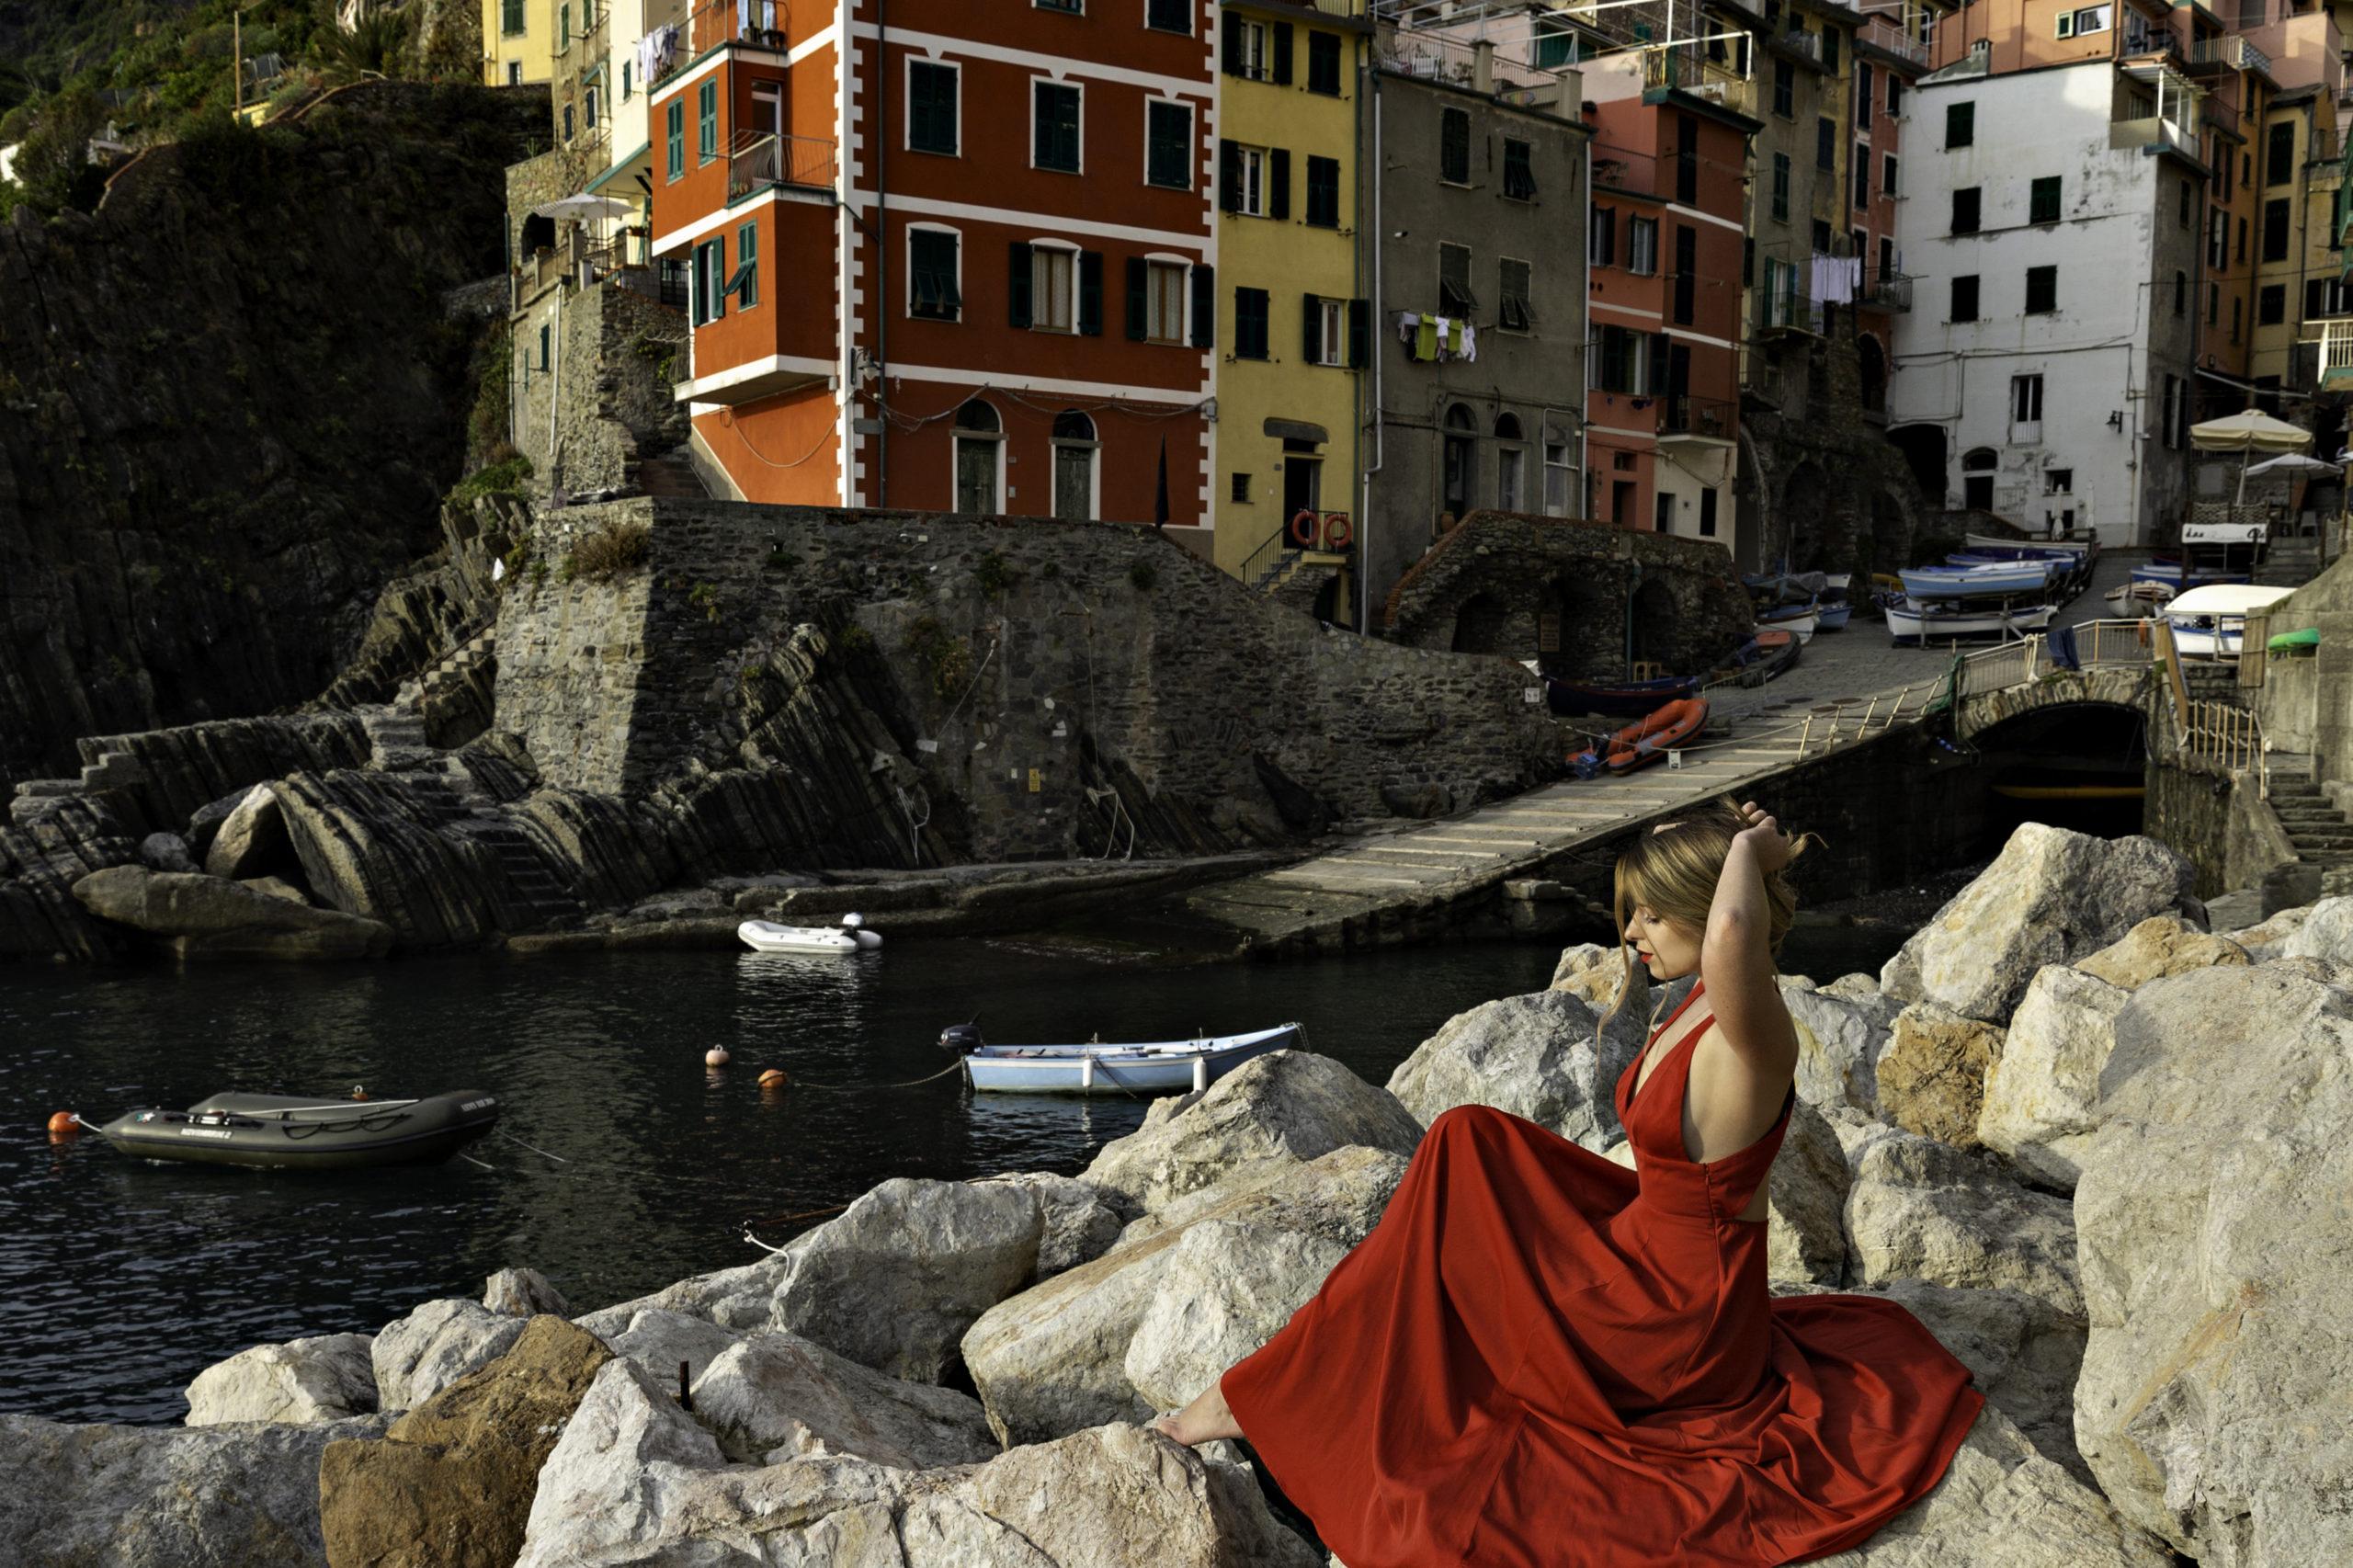 Sarah Baboro Photographe Destinations Afrique Amérique du Nord Asie Europe Italie Cinque Terre Riomaggiore